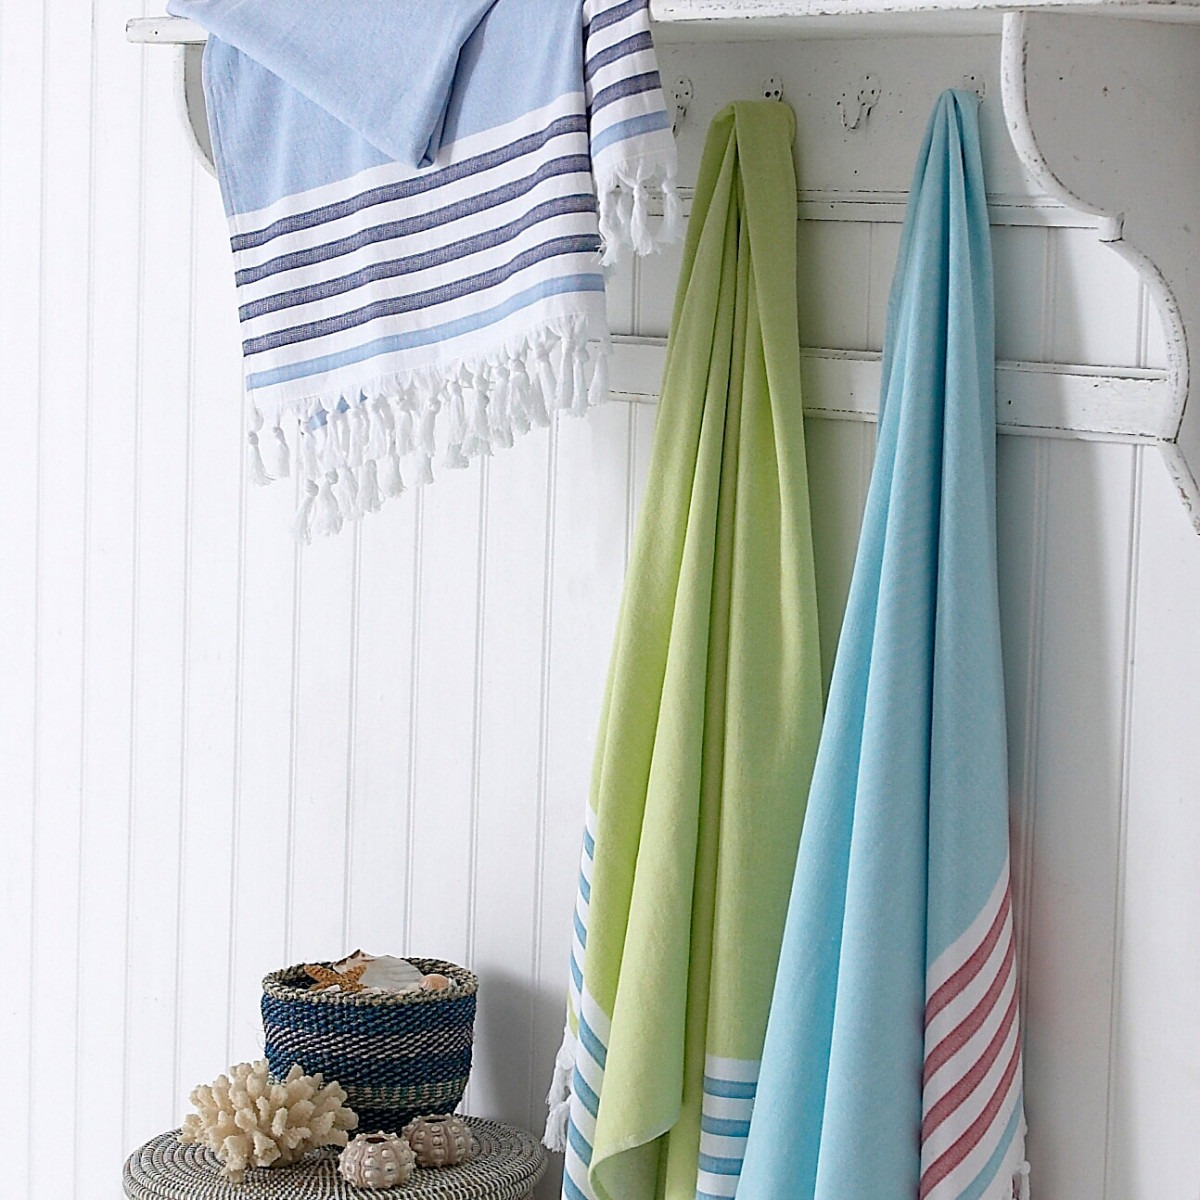 Colourful Haman Towels